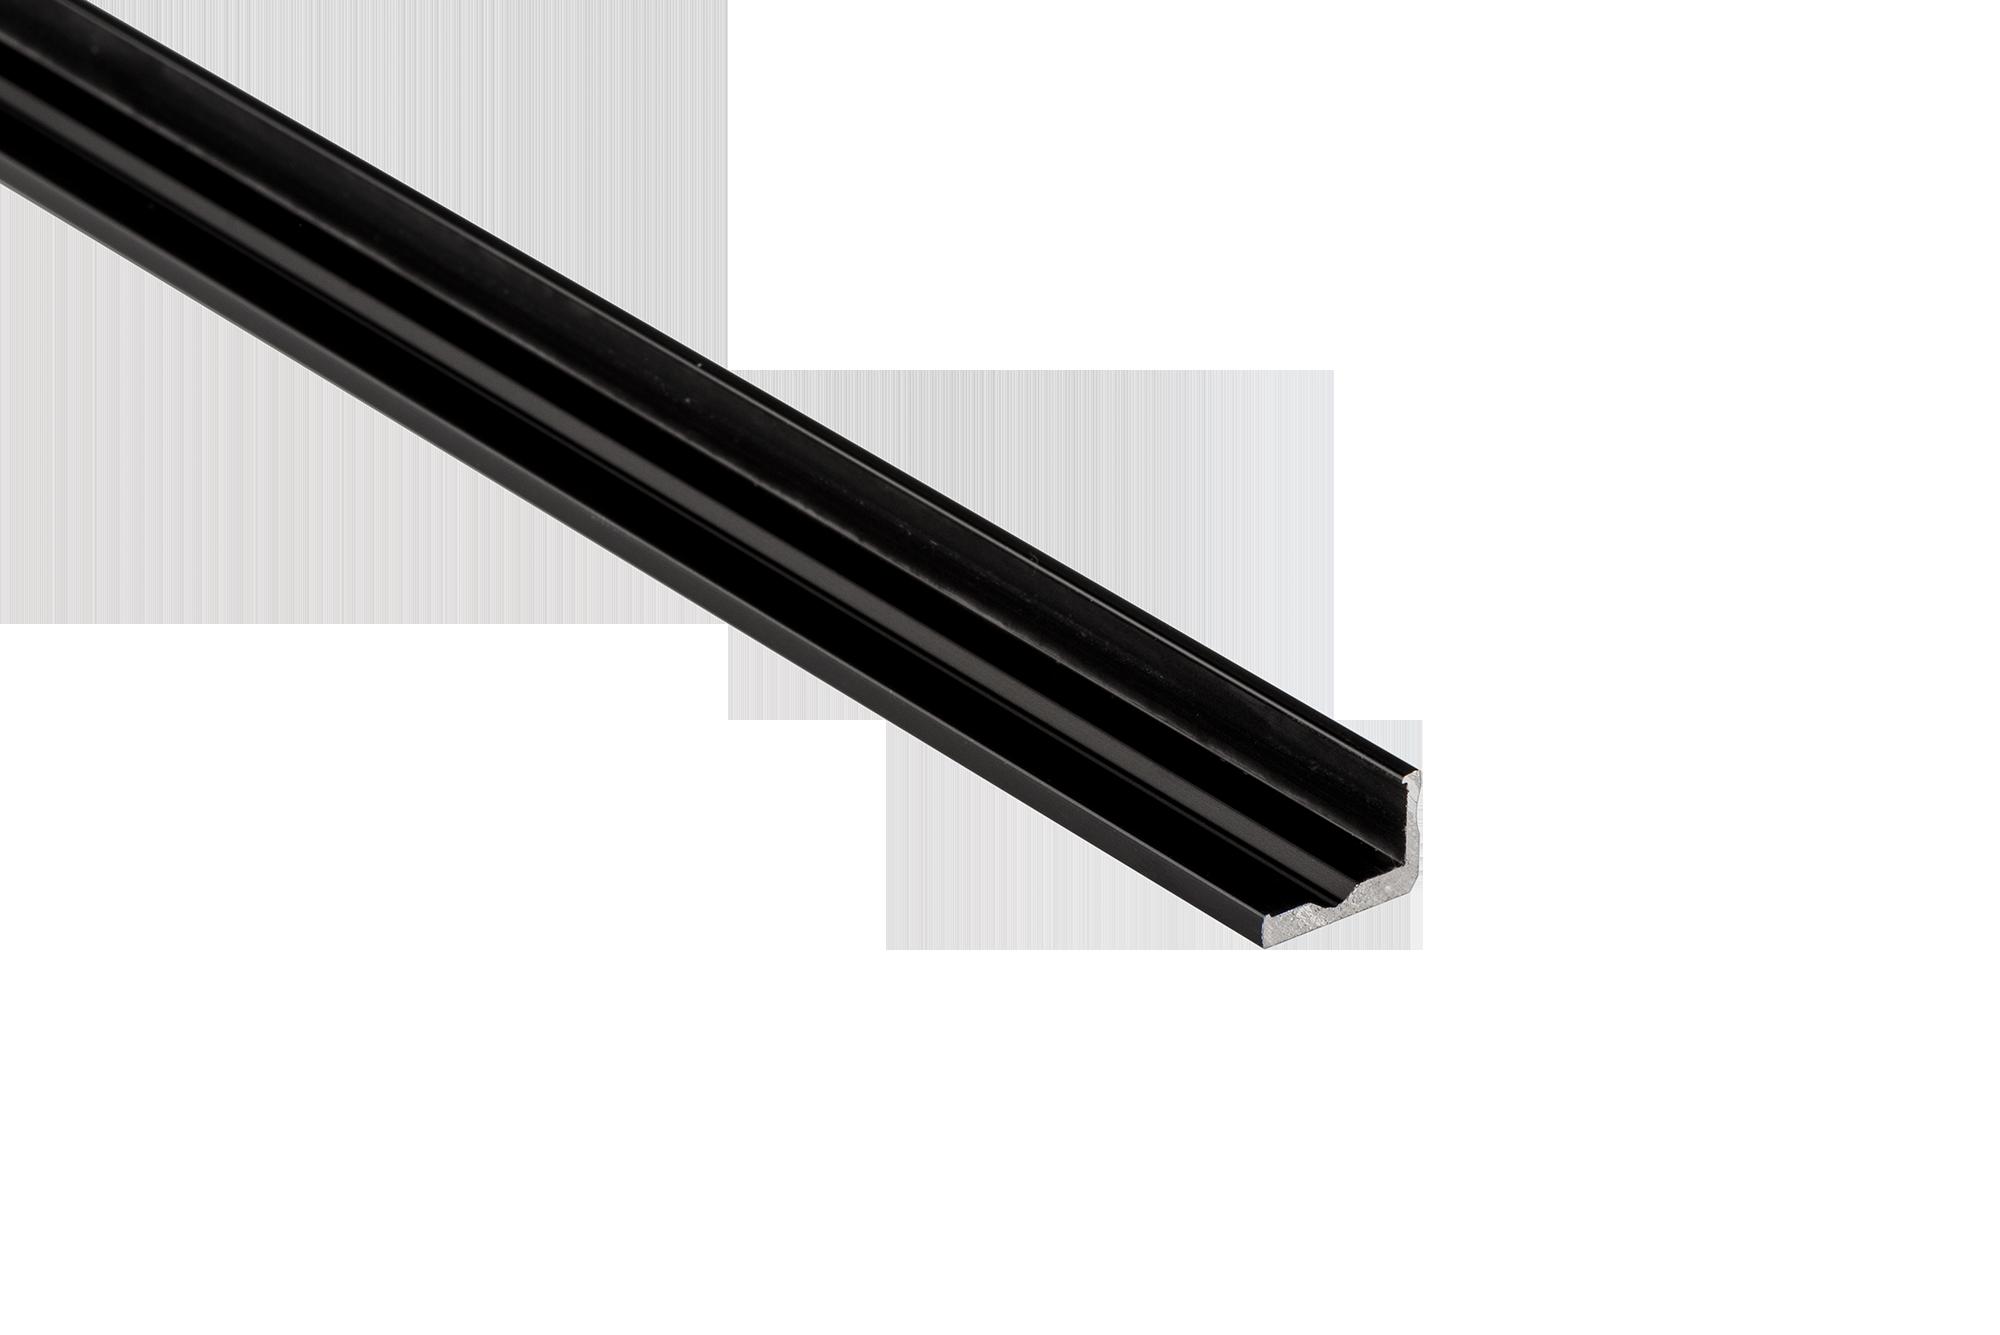 Type F Black Anod Image